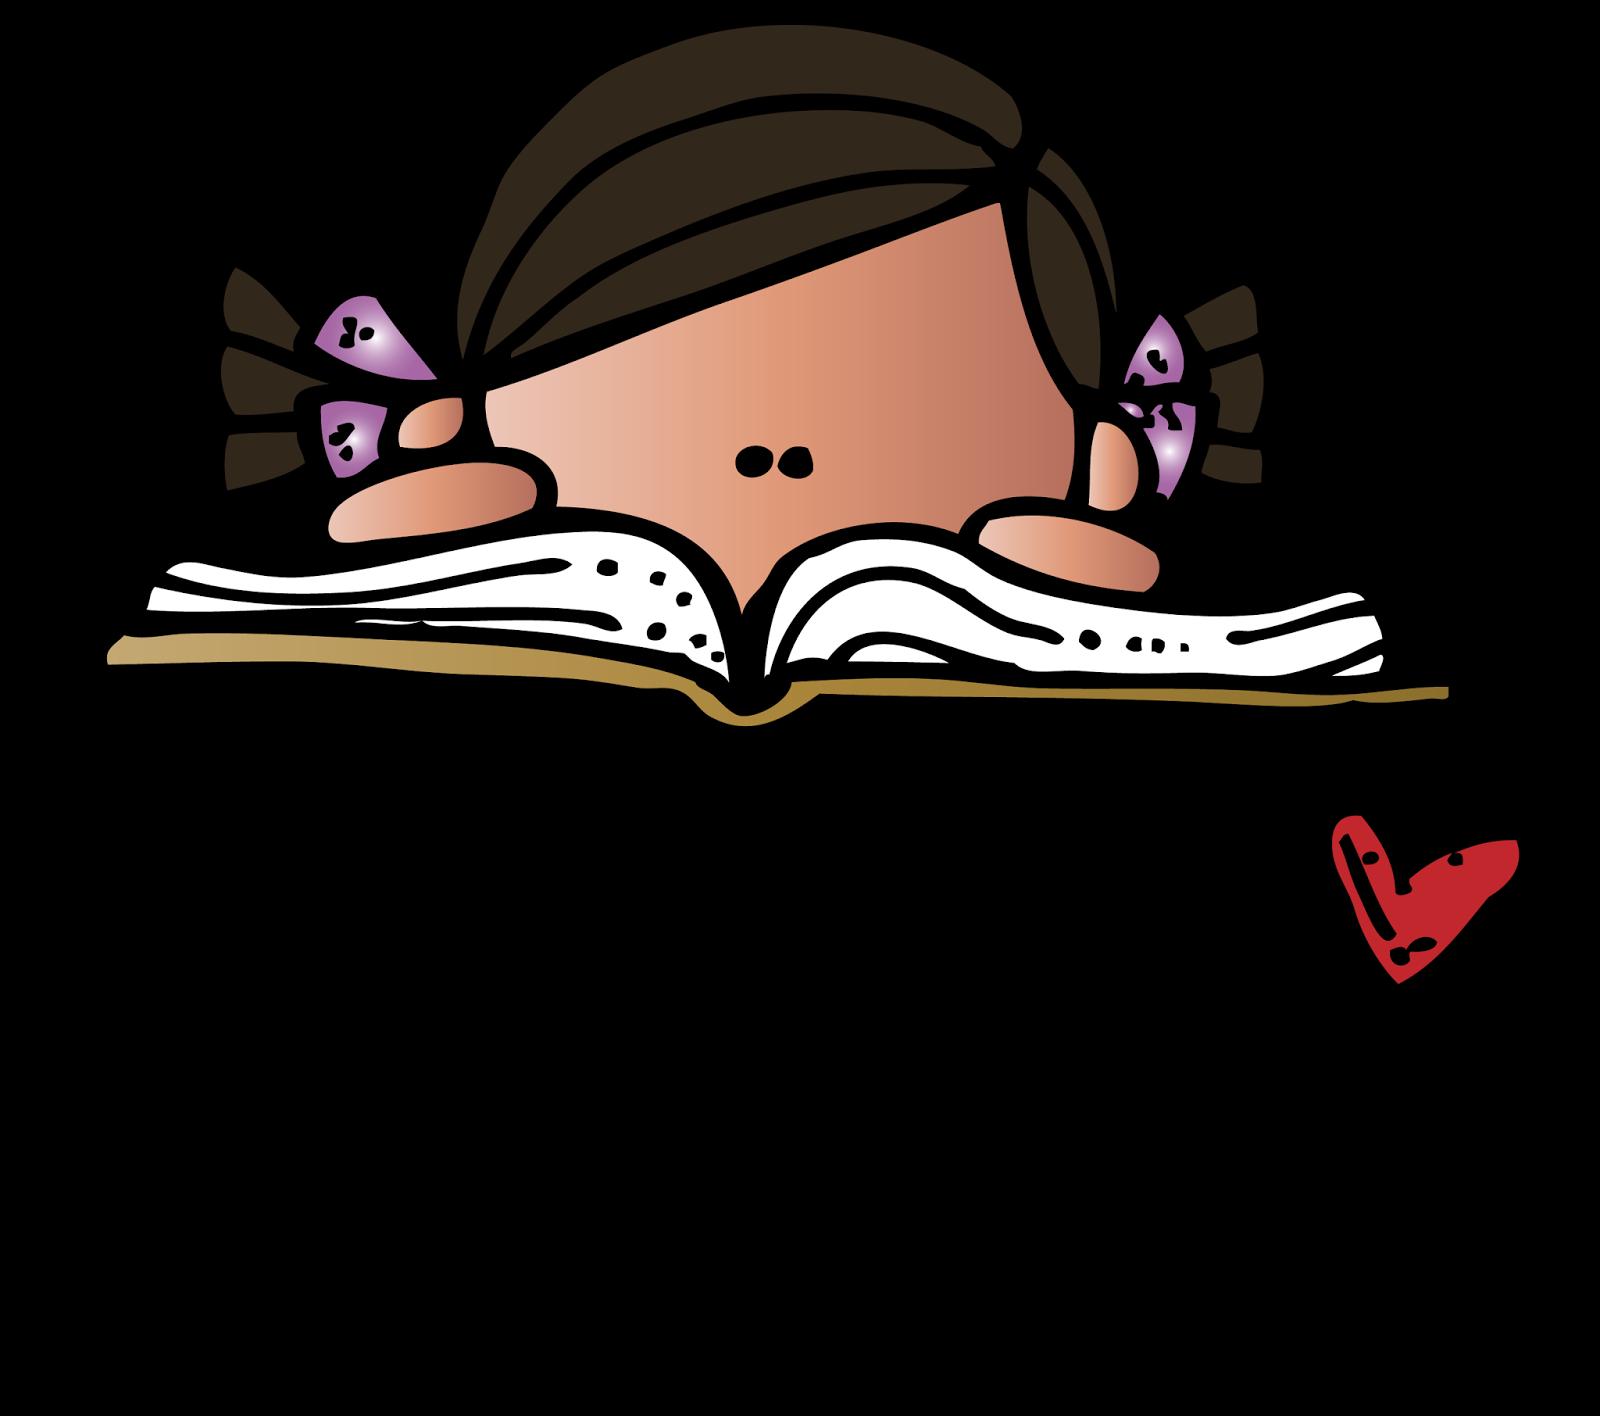 Clipart reading melonheadz. Lds illustrating april xox